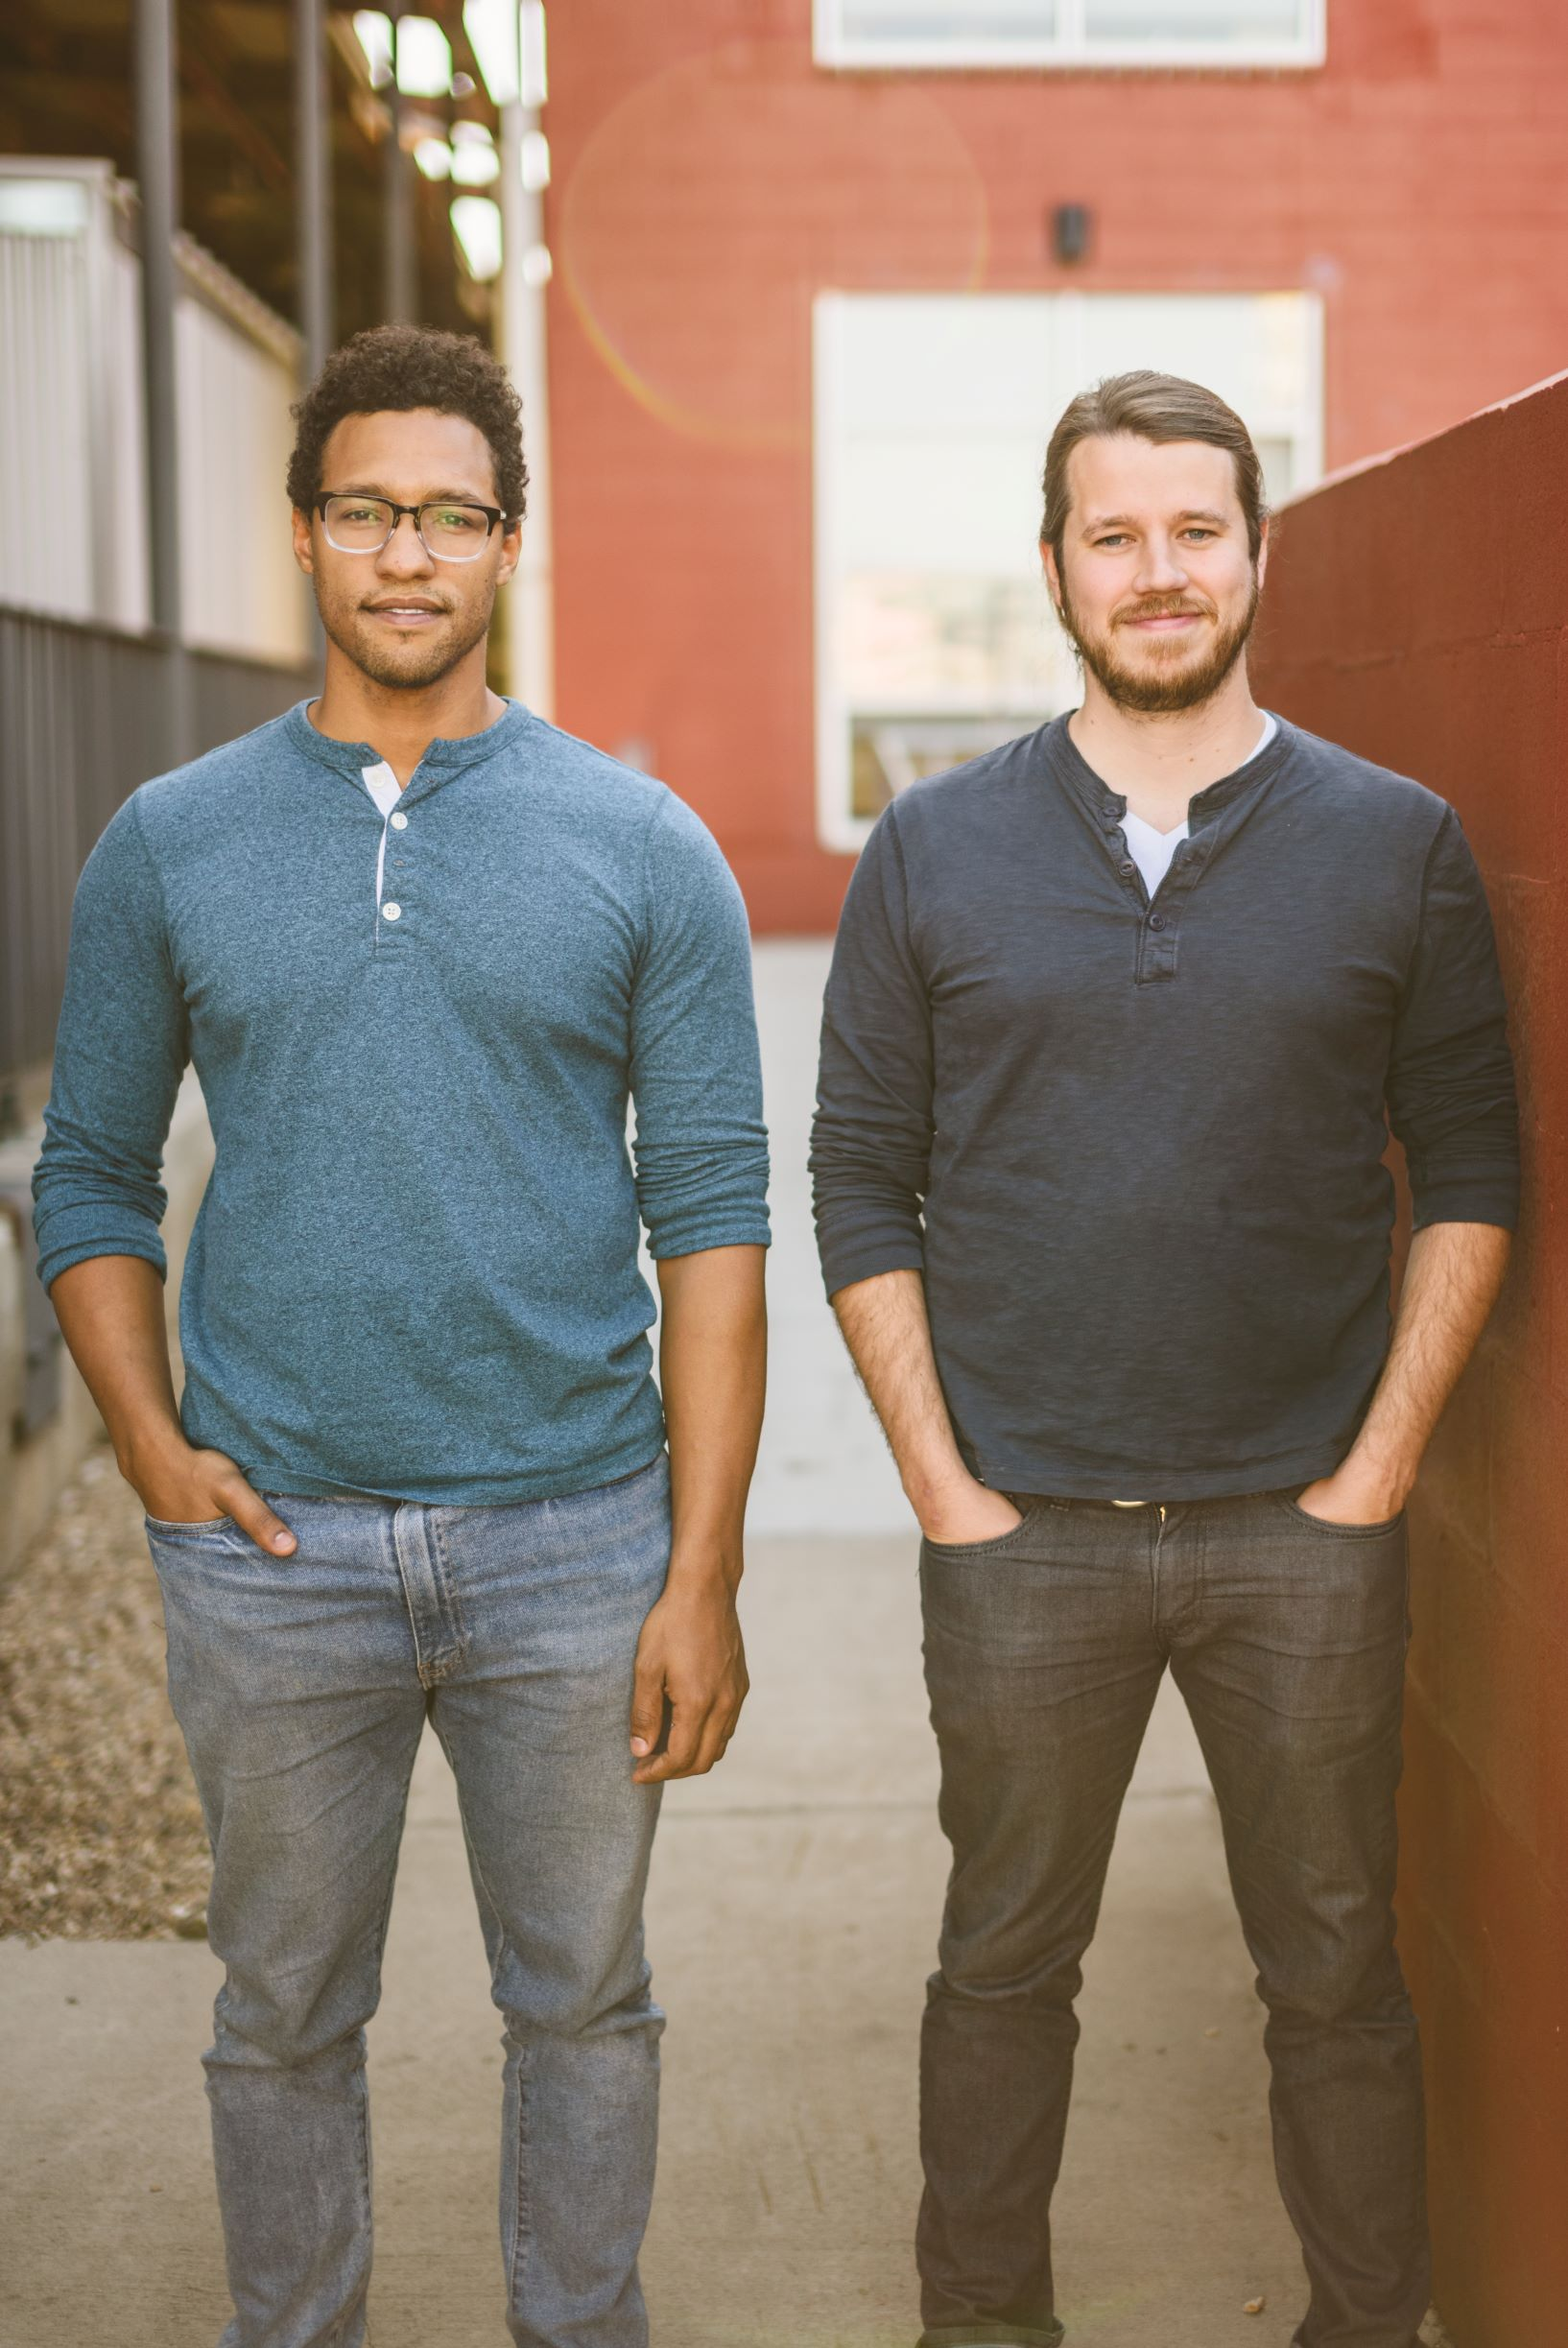 BLDR cofounders: Brandon Lewis and Luke Rabin